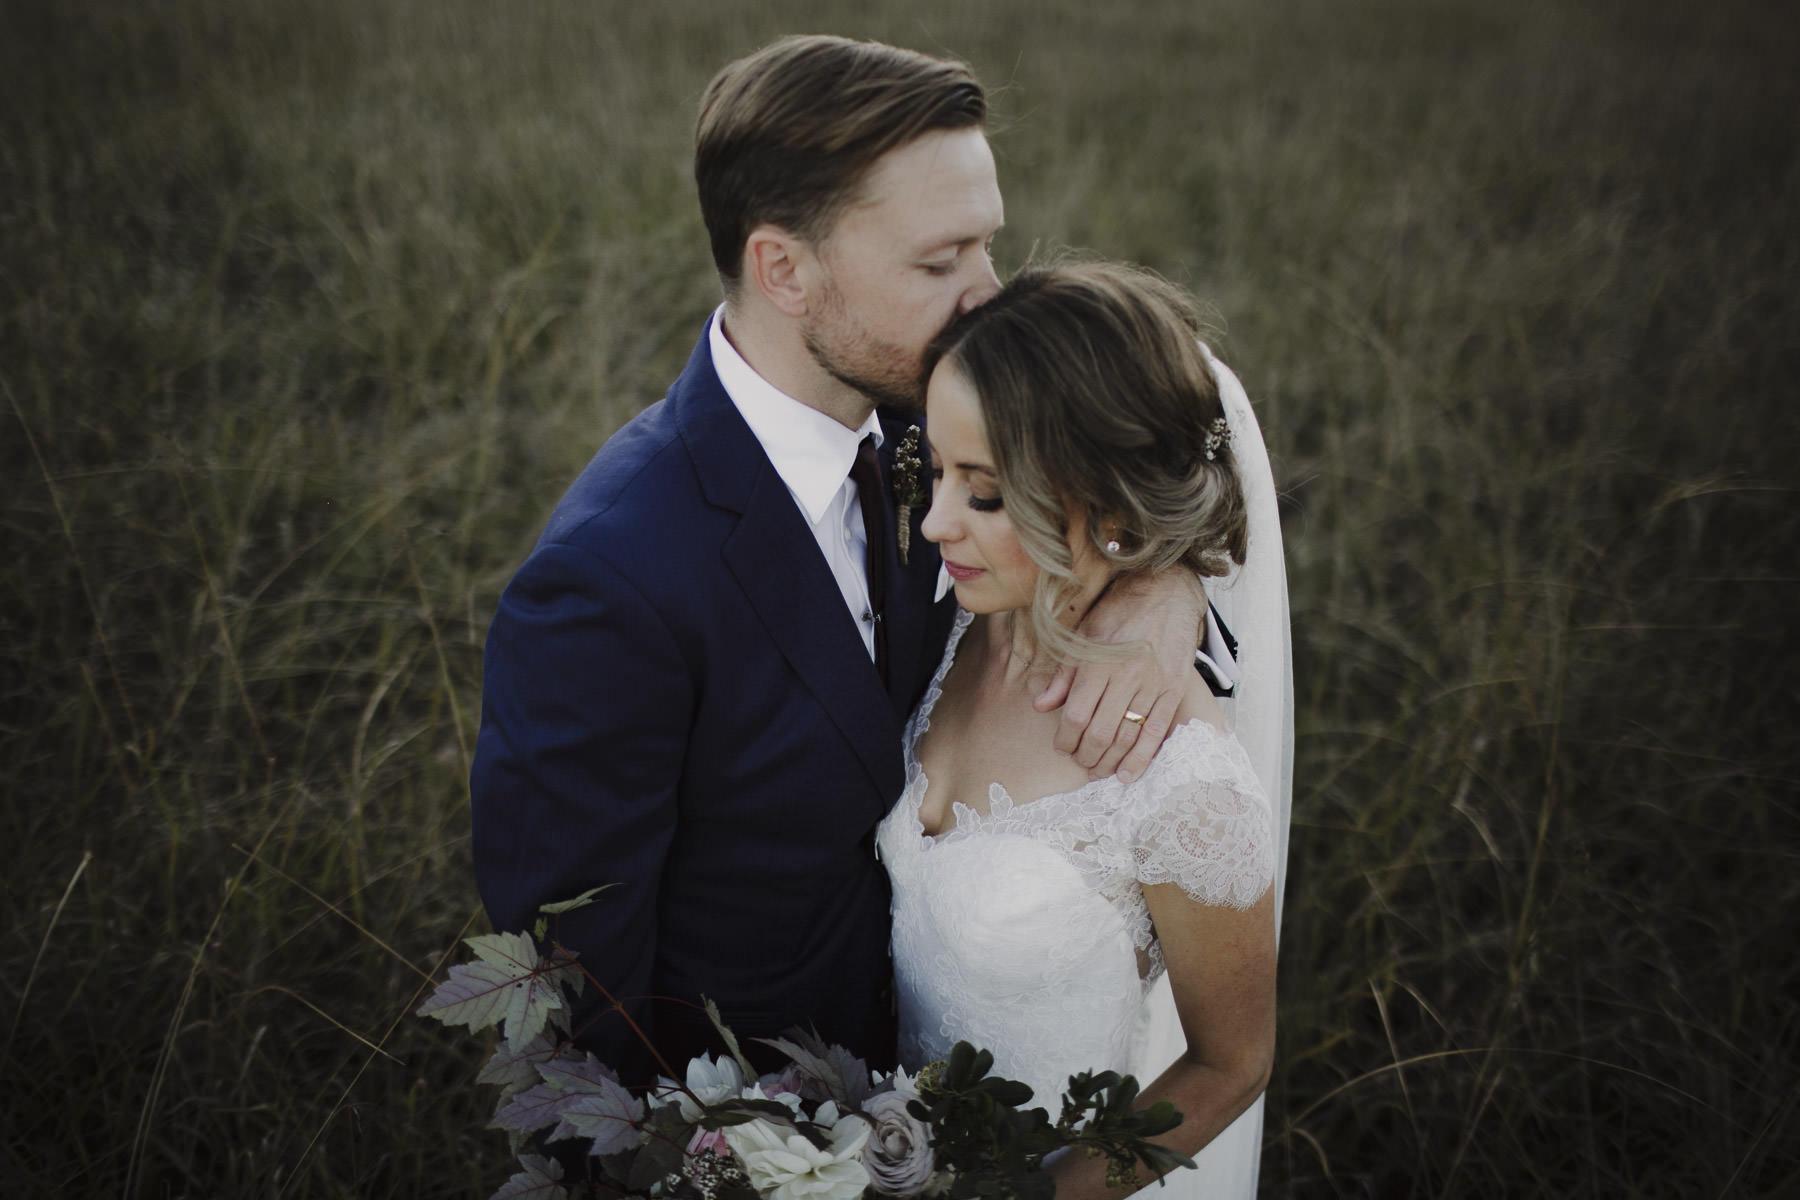 160506_justinaaron_wedding_holly_daniel_pr-183.jpg